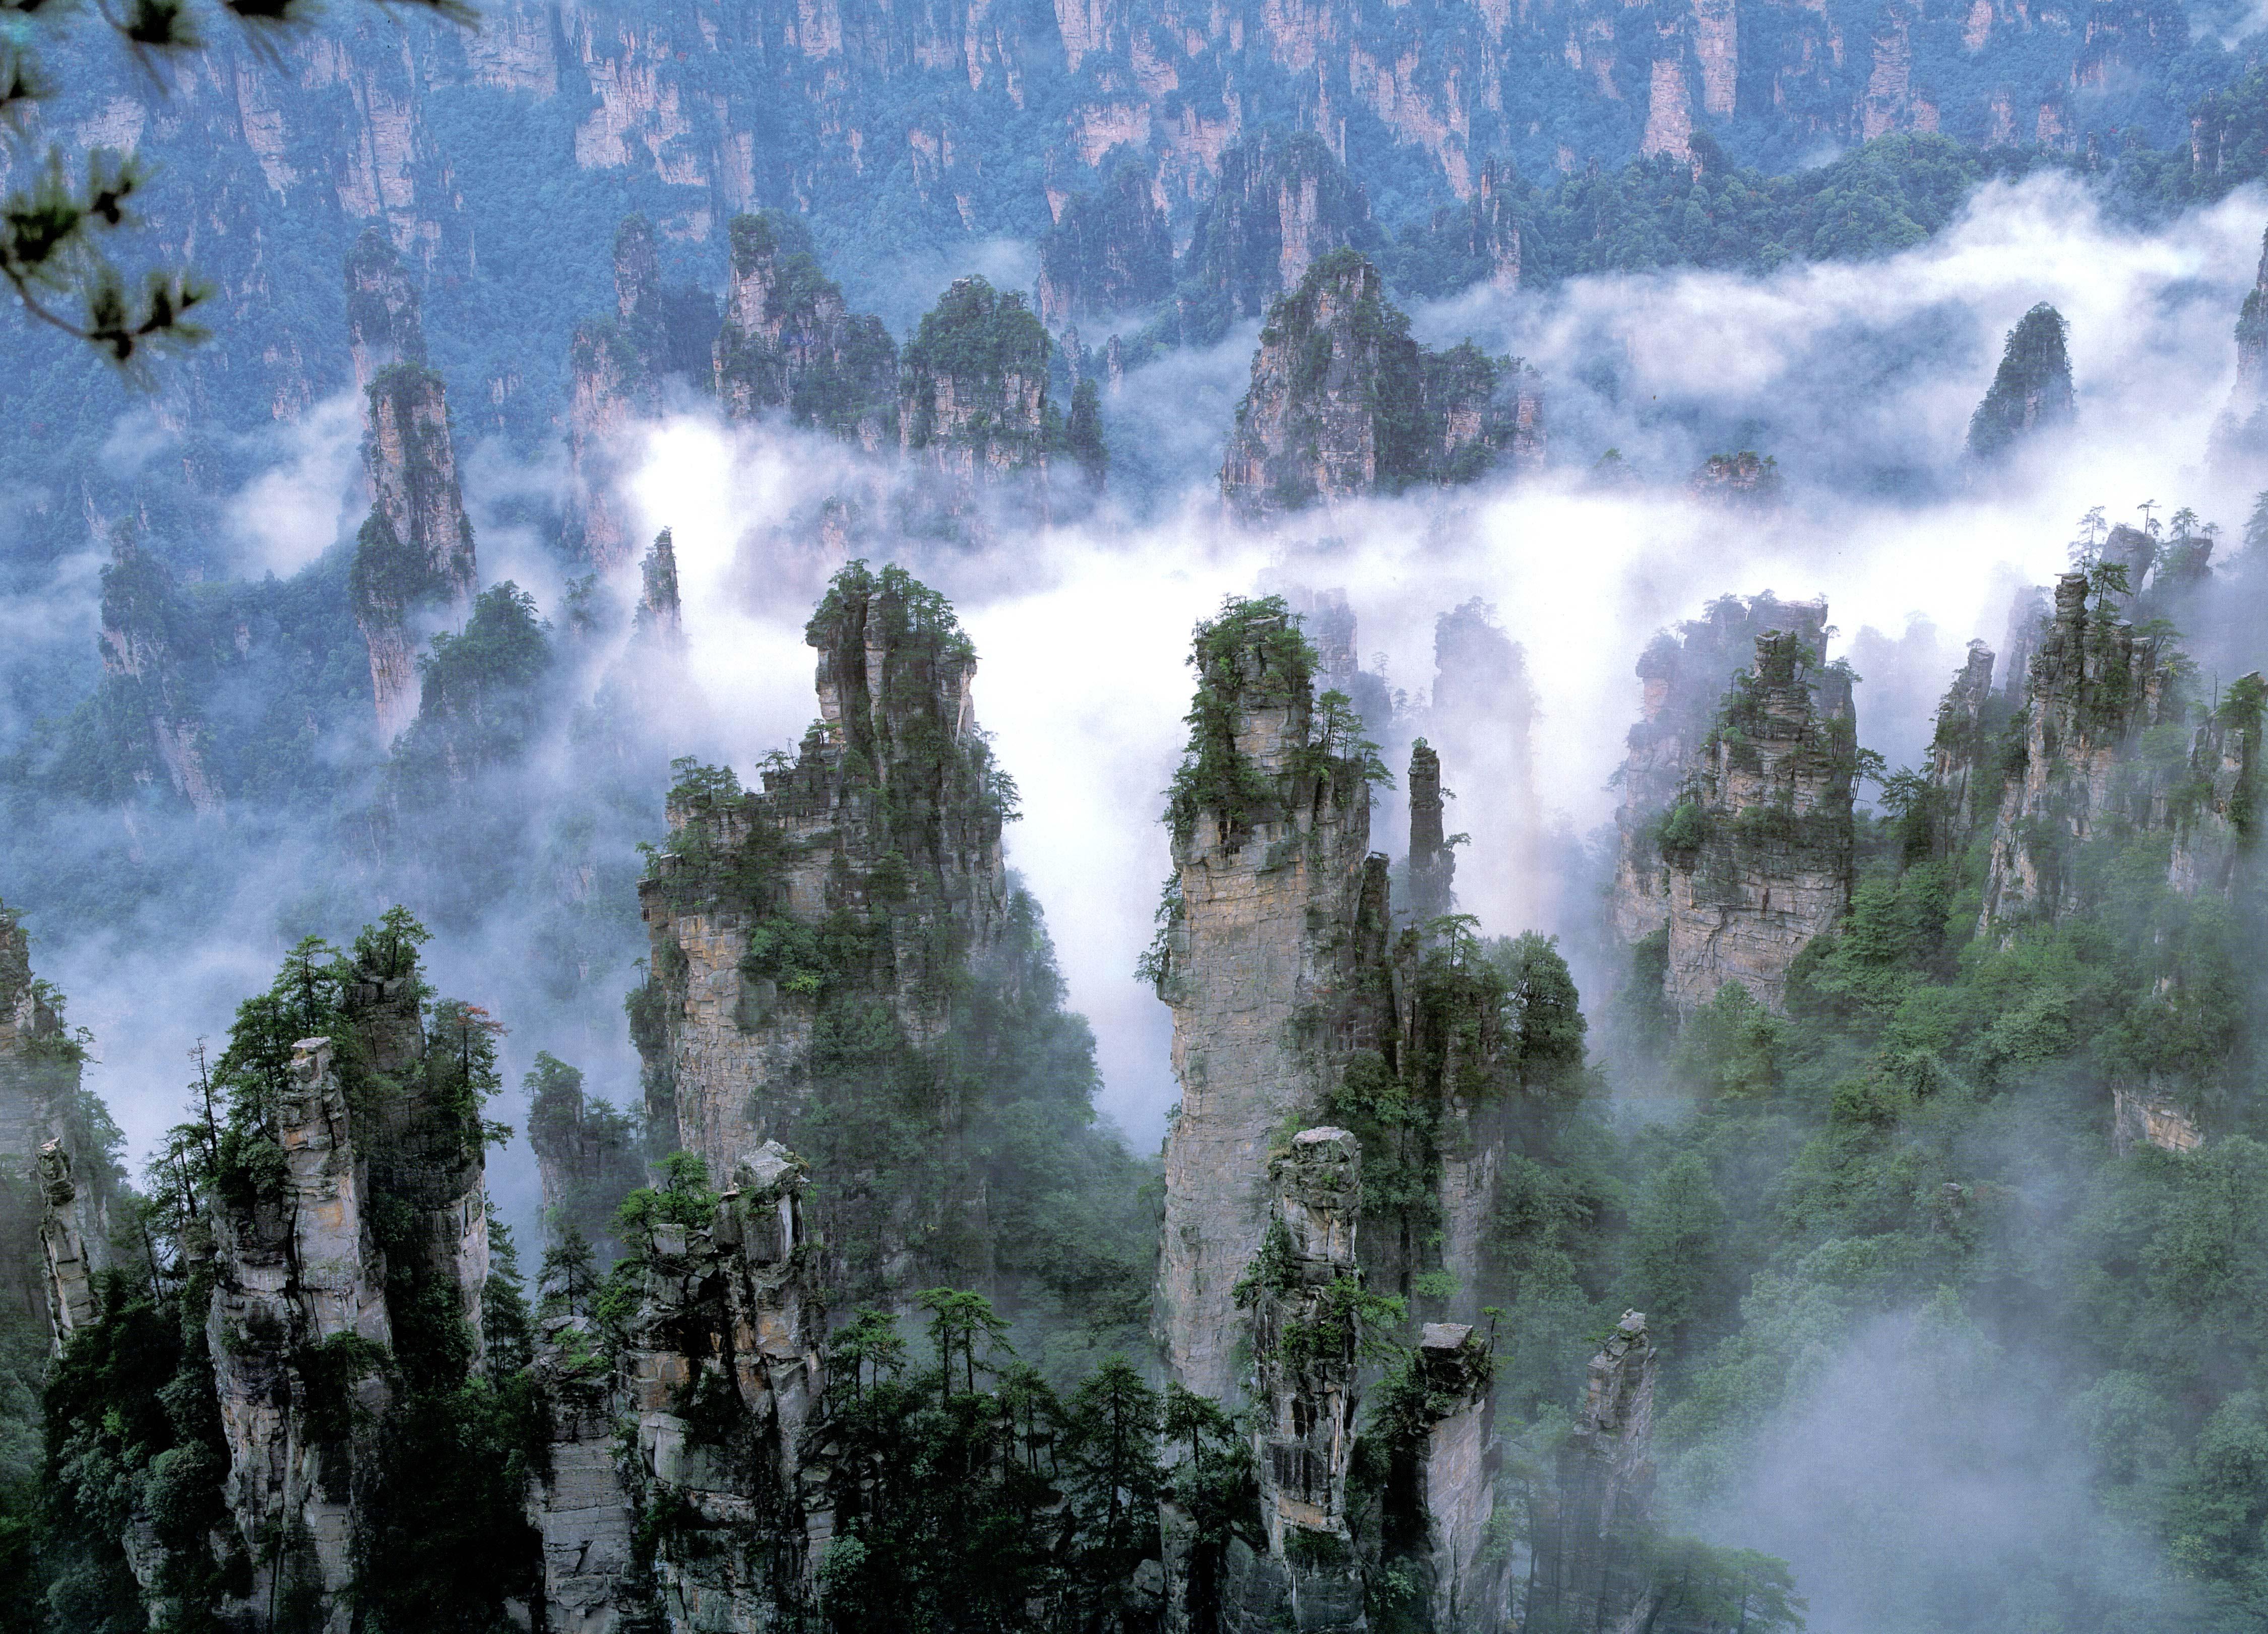 tianzi-mountains-the-monarch-of-the-pea-secret-world